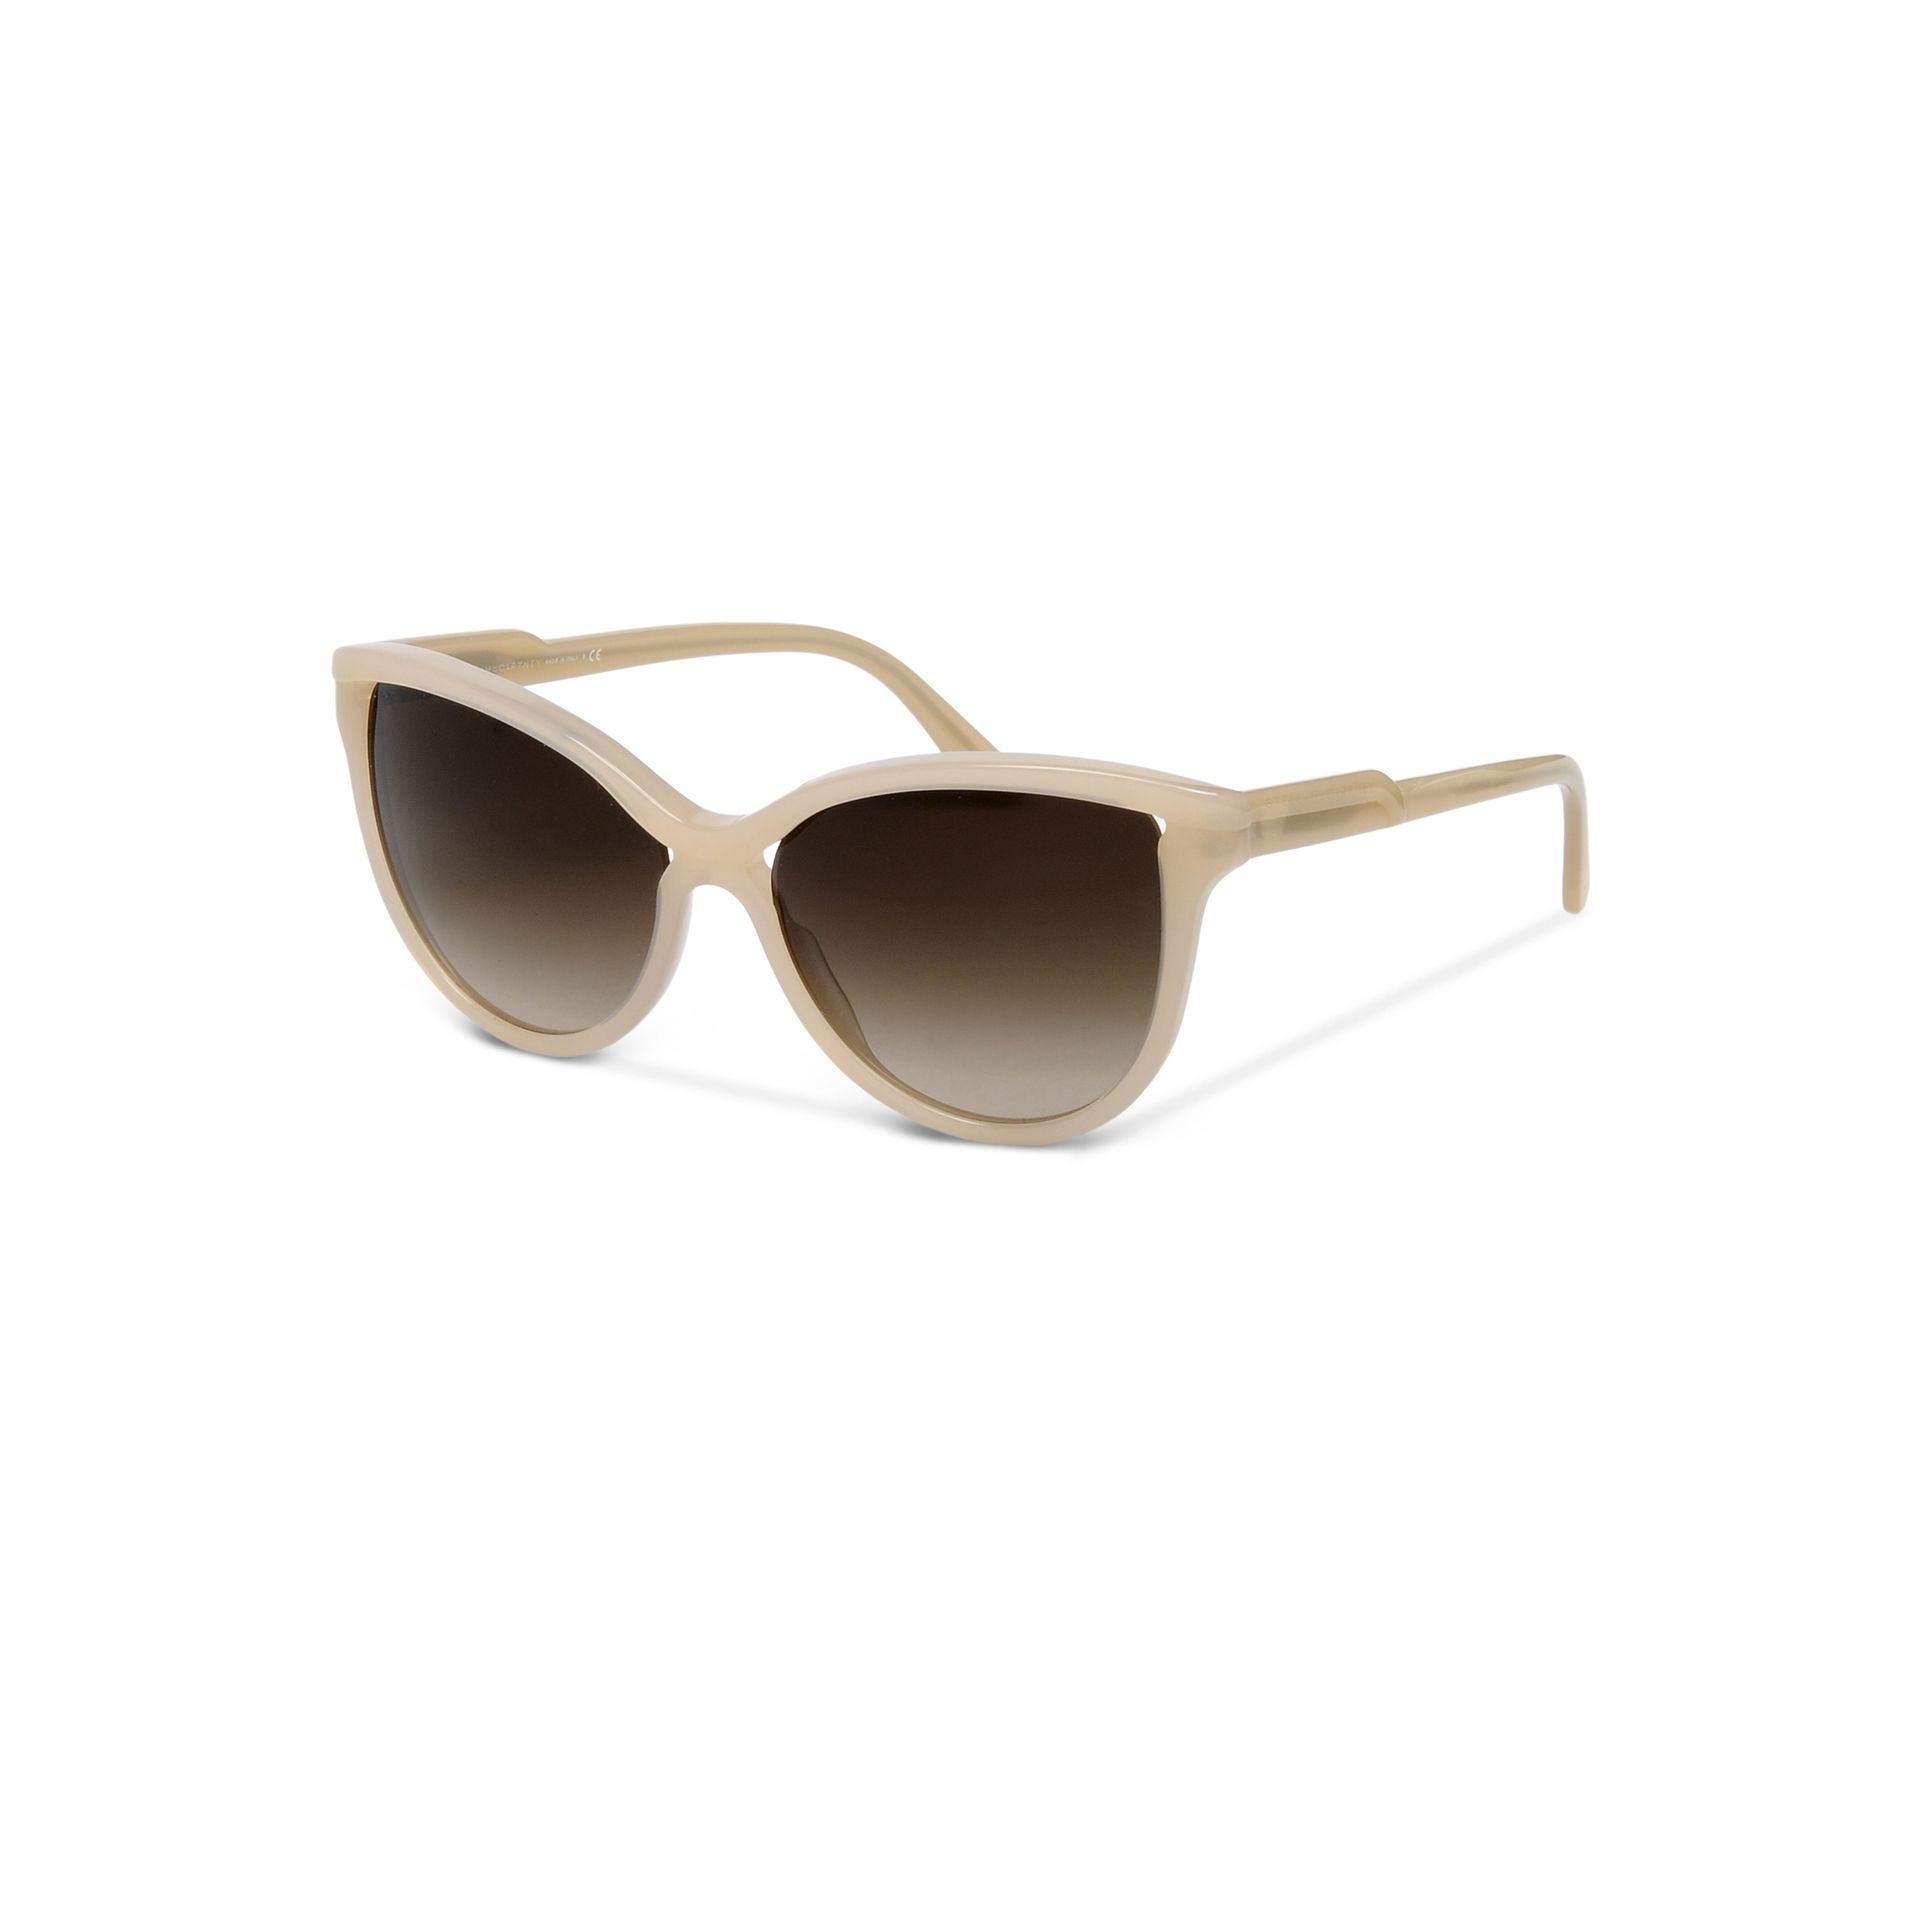 b78634a587 Stella mccartney Cat Eye Sunglasses in Gray